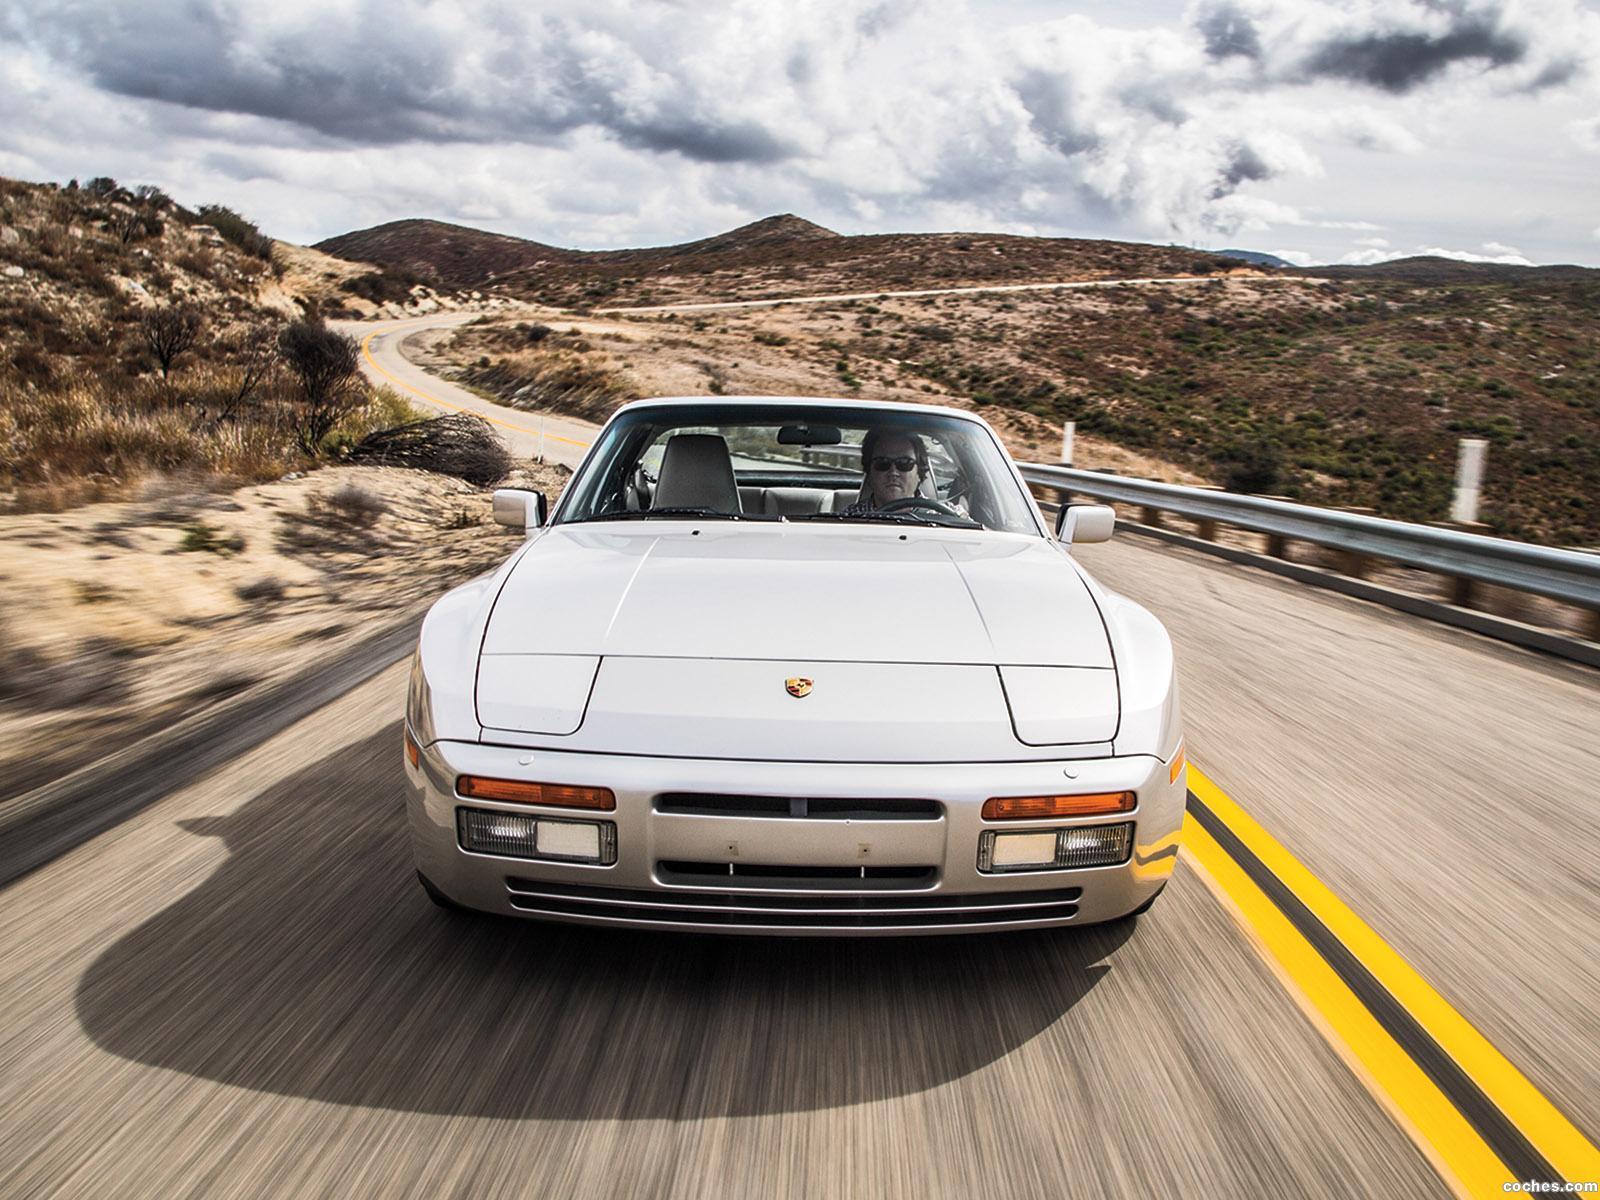 Foto 10 de Porsche 944 S2 USA 1989